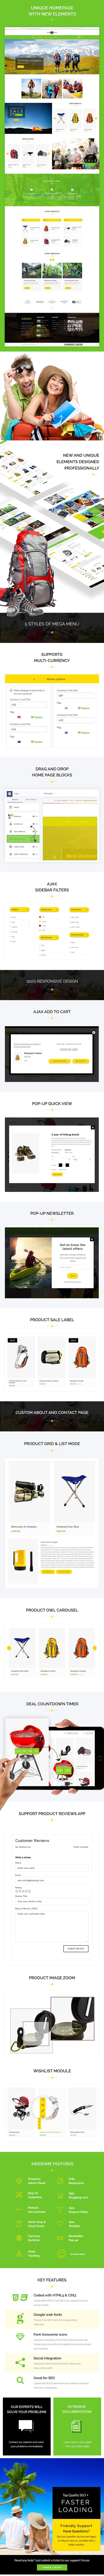 Logan - Travel, Adventure Store Shopify Theme - 1 Logan - Adventure, Travel Store Shopify Theme Nulled Free Download Logan – Adventure, Travel Store Shopify Theme Nulled Free Download promo